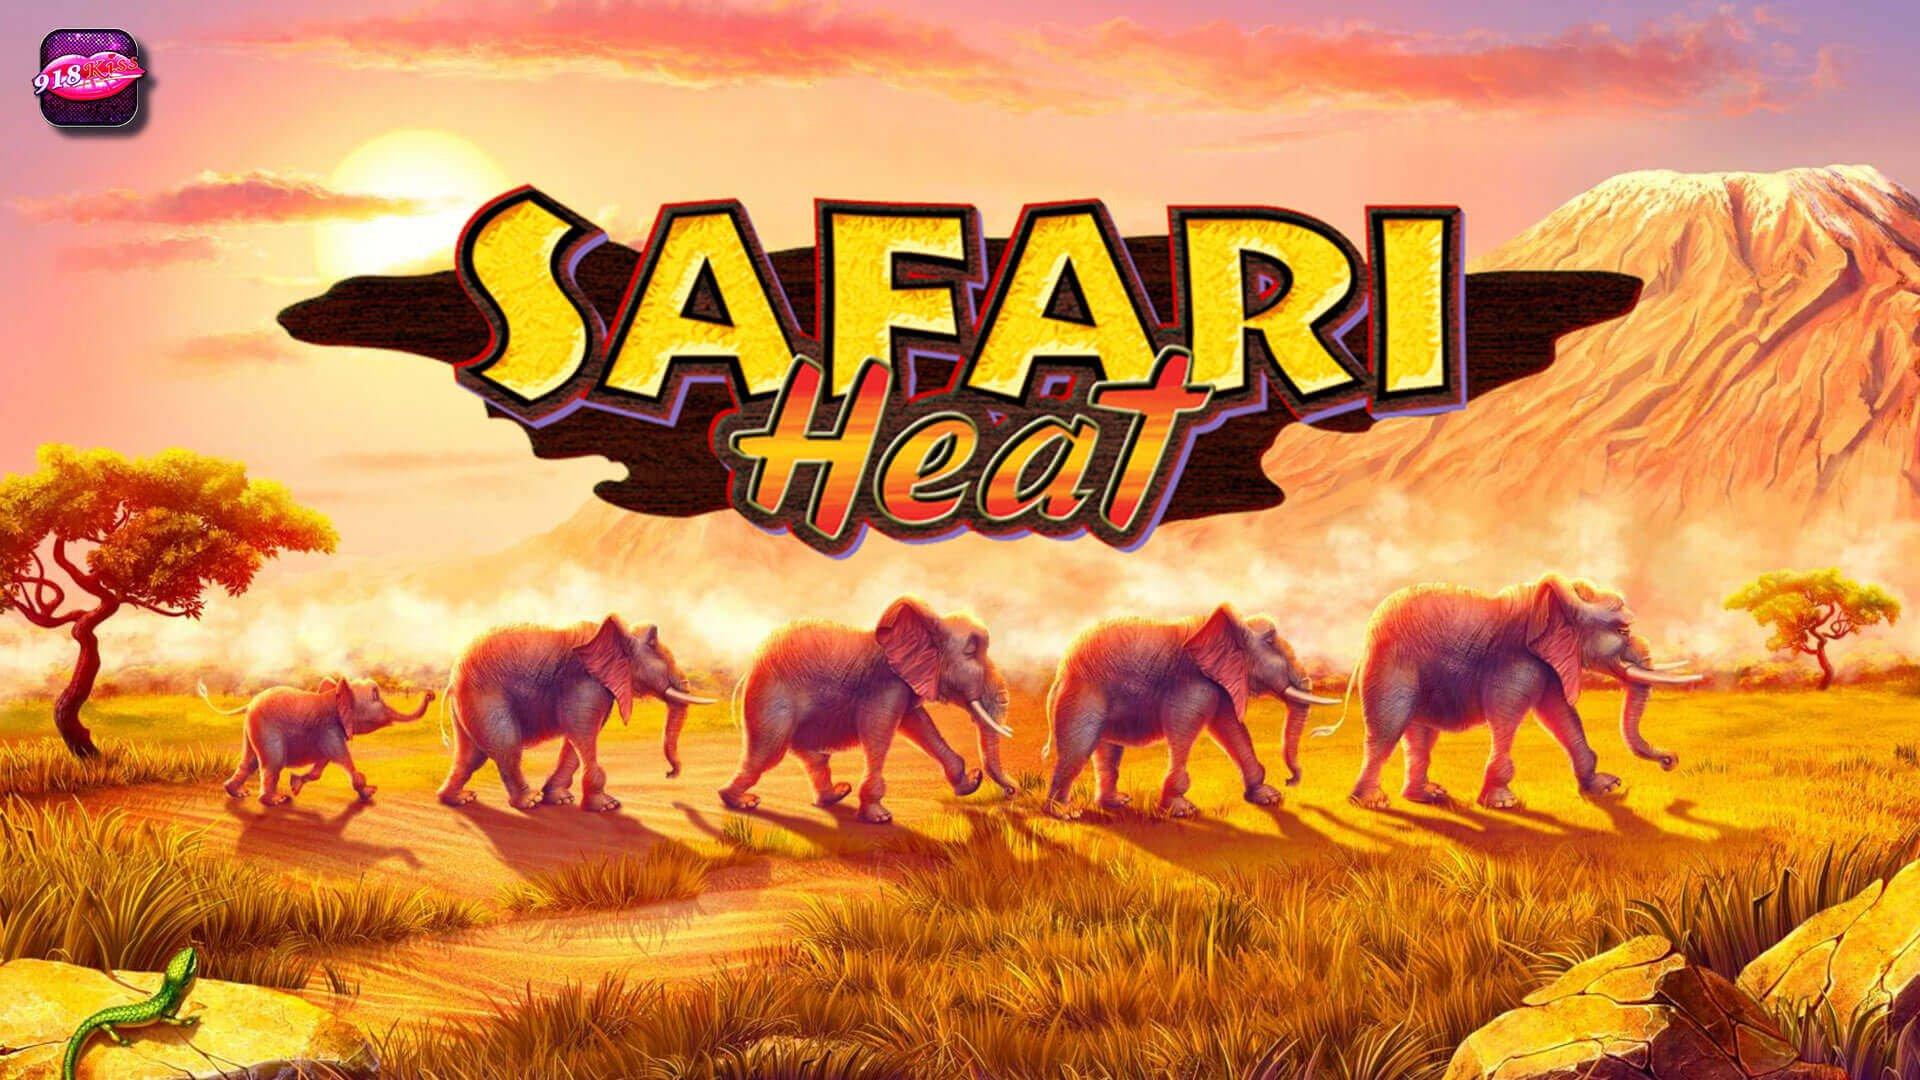 非洲野生动物 | Safari Heat